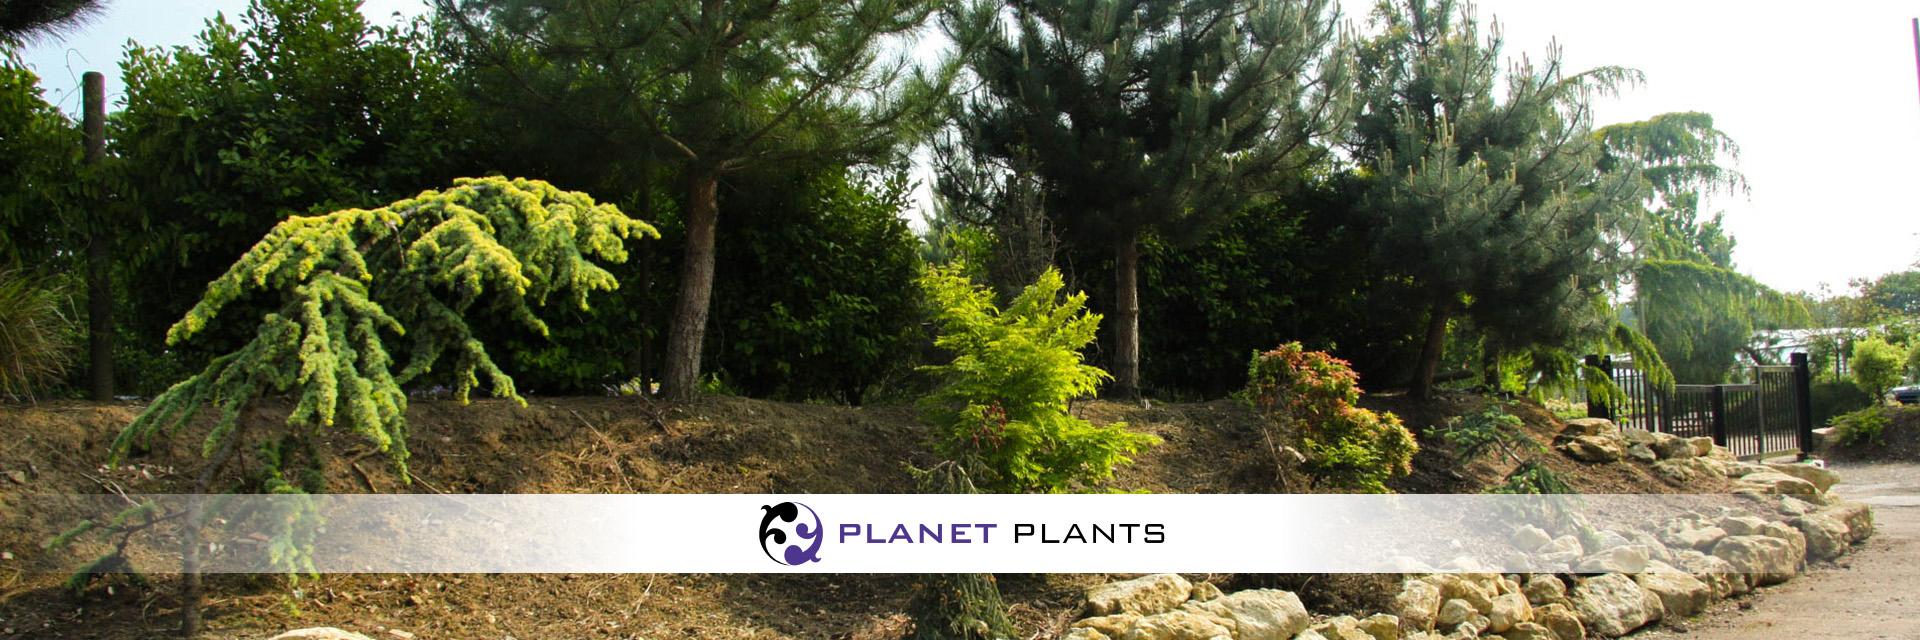 Planet Plants